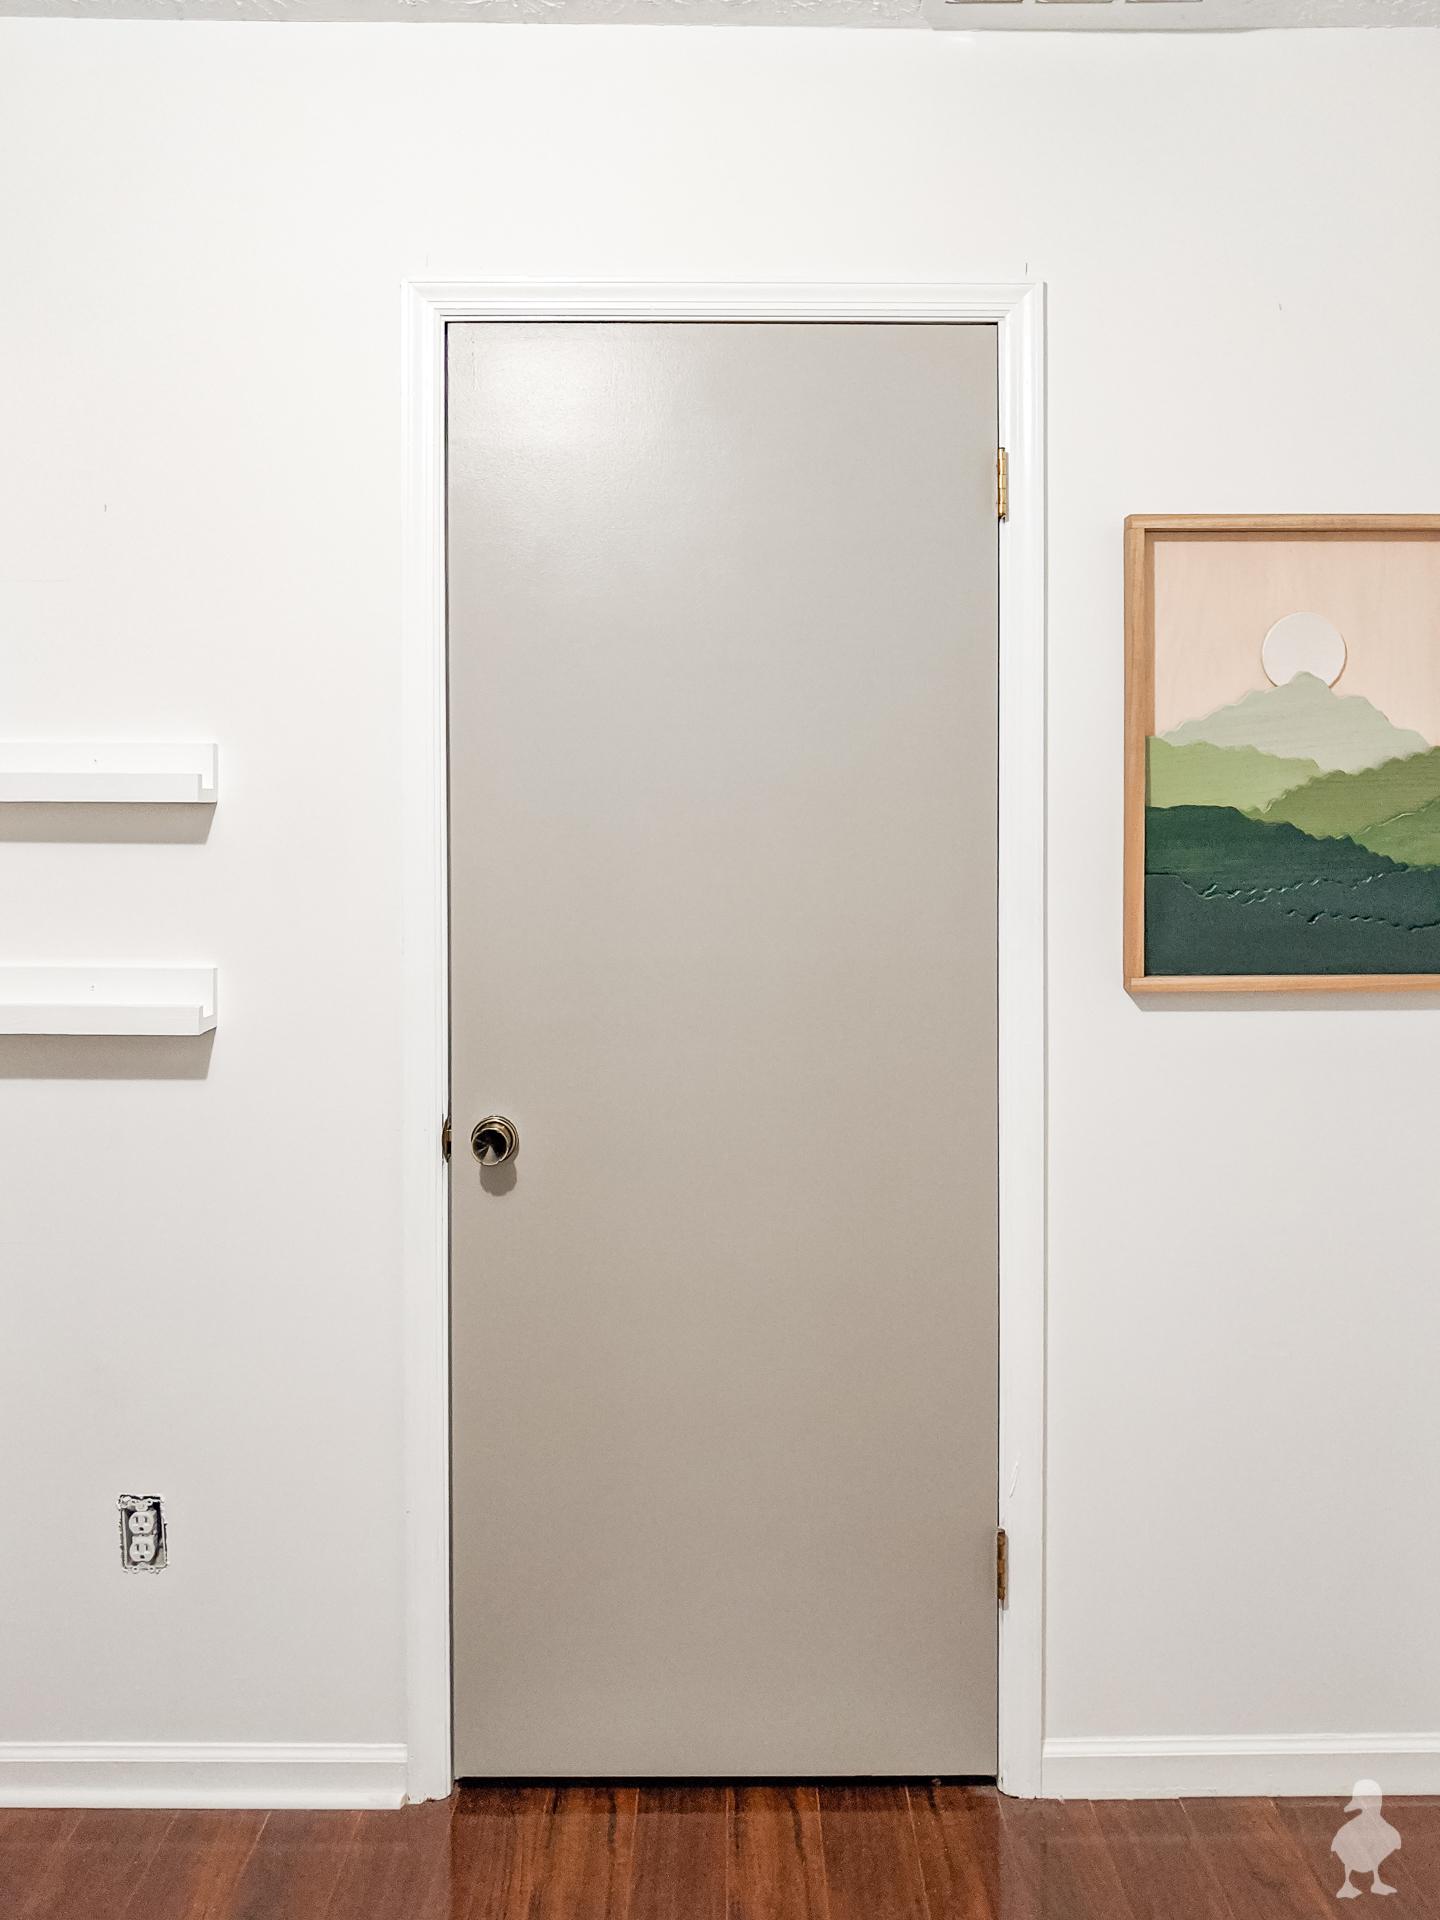 working on the nursery - progress gray wall and new art